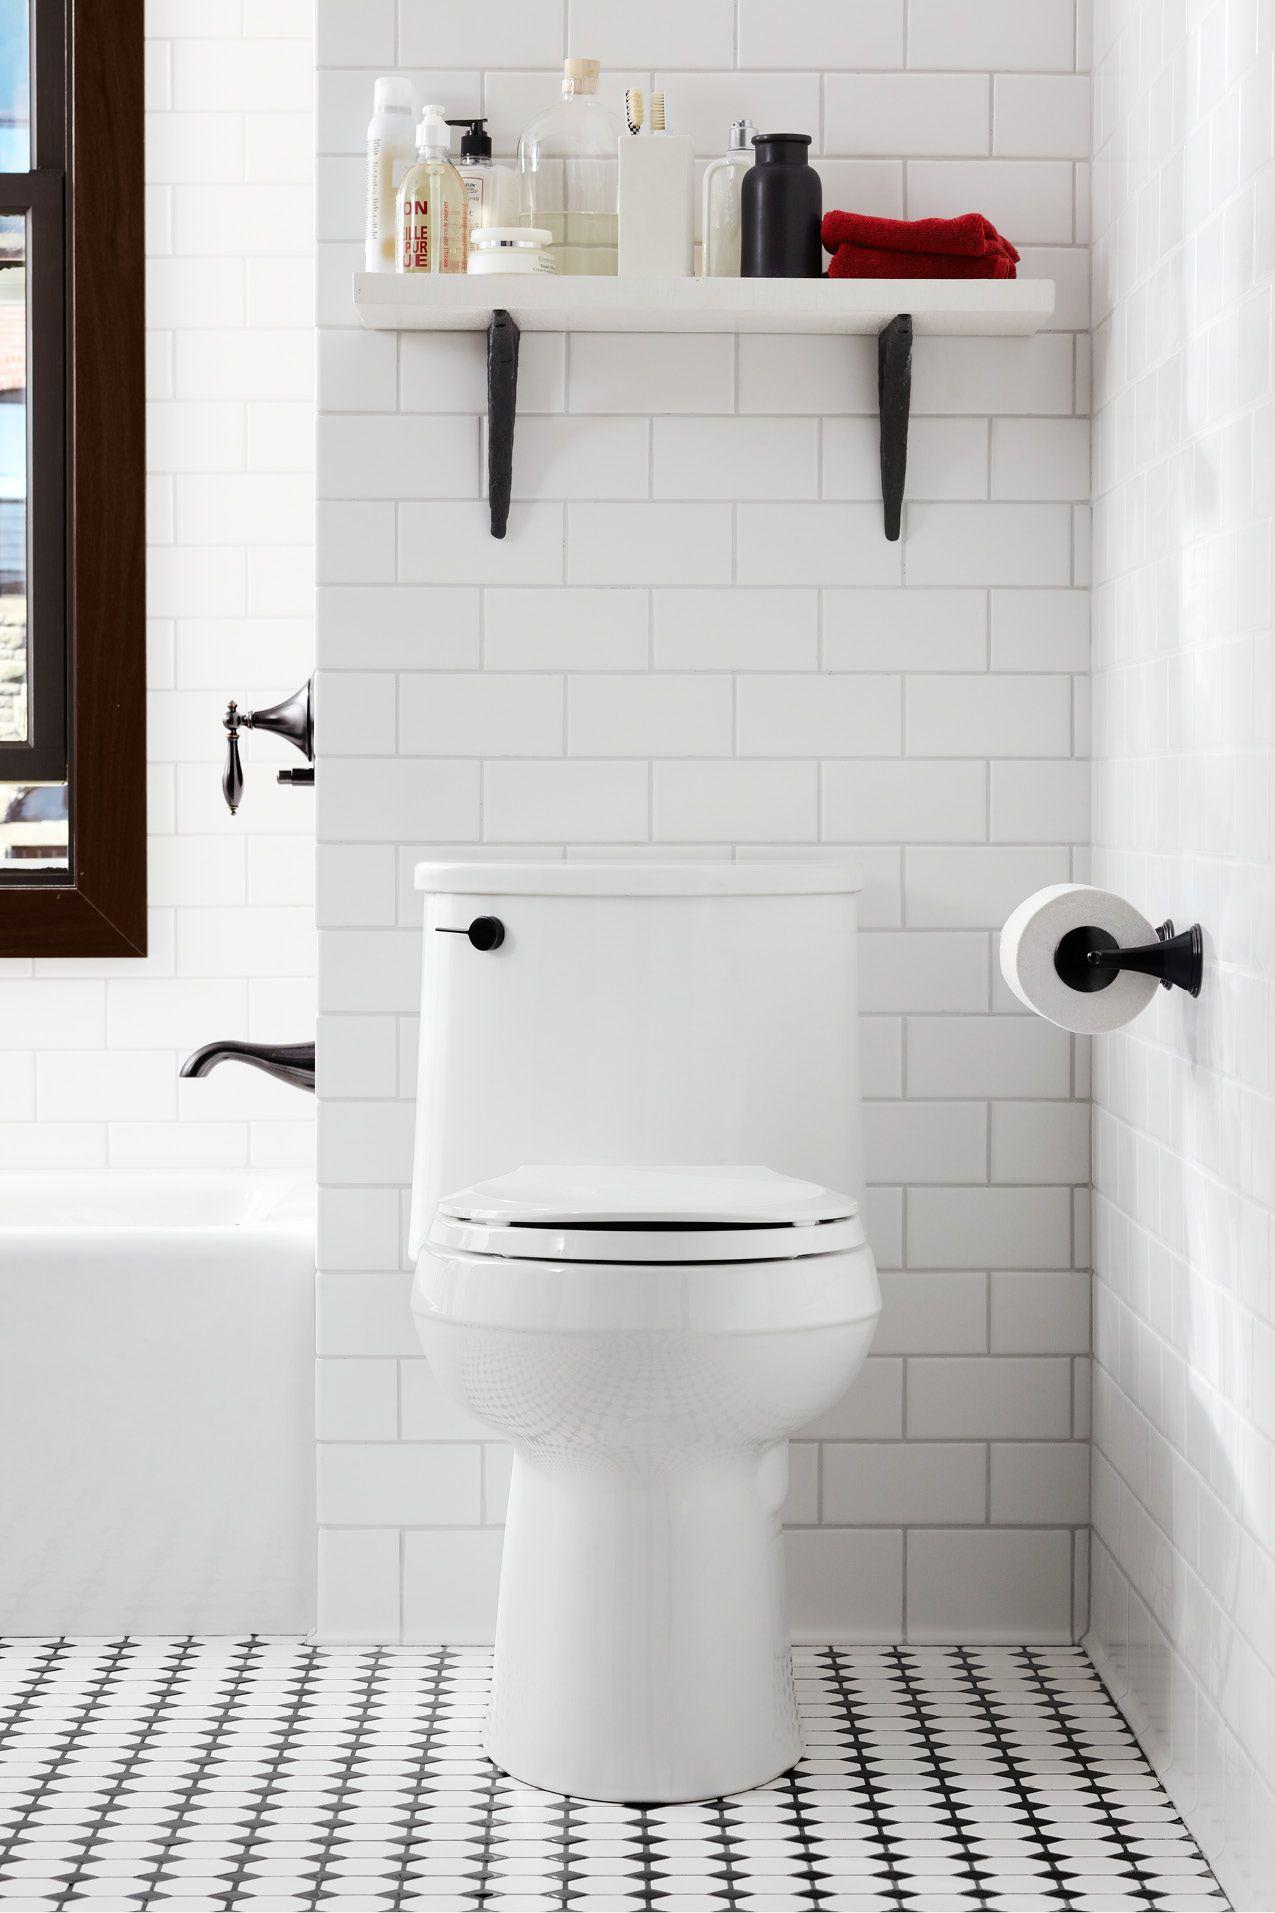 Brooklyn Style Bathroom Kohler Ideas Small Bathroom Interior Bathroom Styling Traditional Toilets